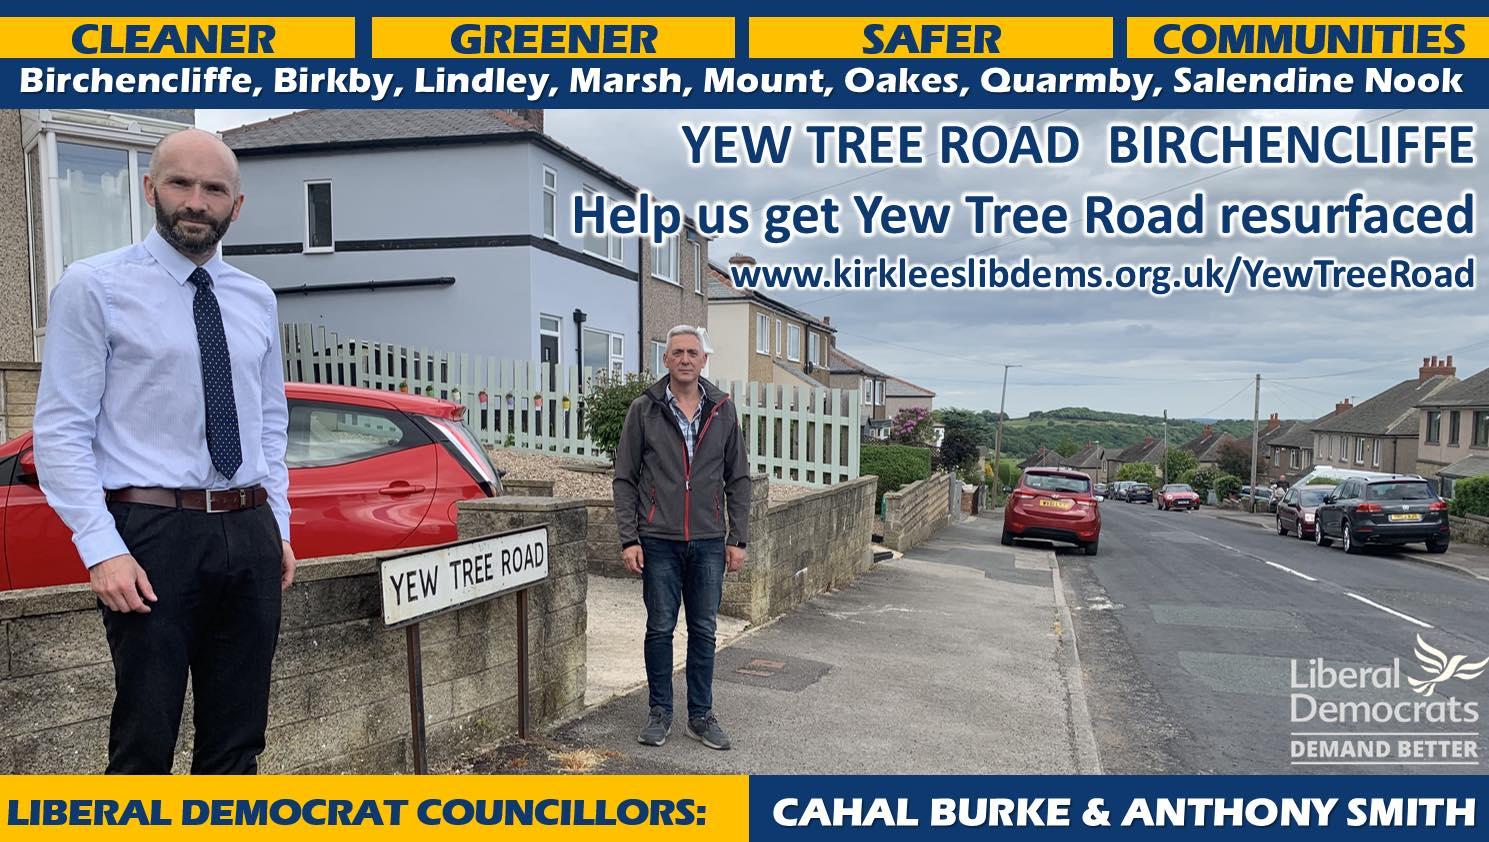 Yew Tree Road